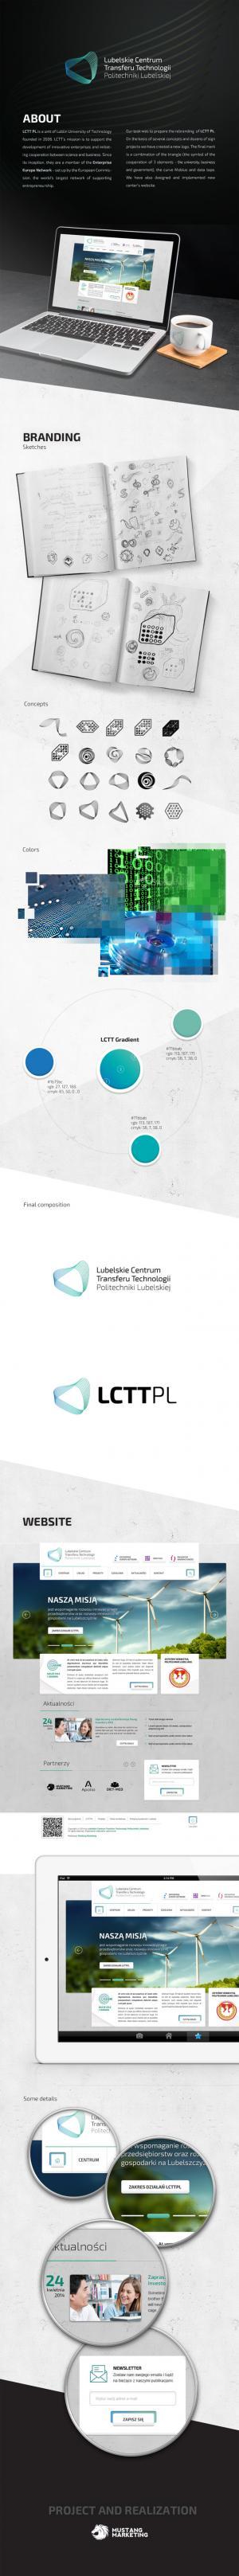 Branding dla LCTT PL - Lublin